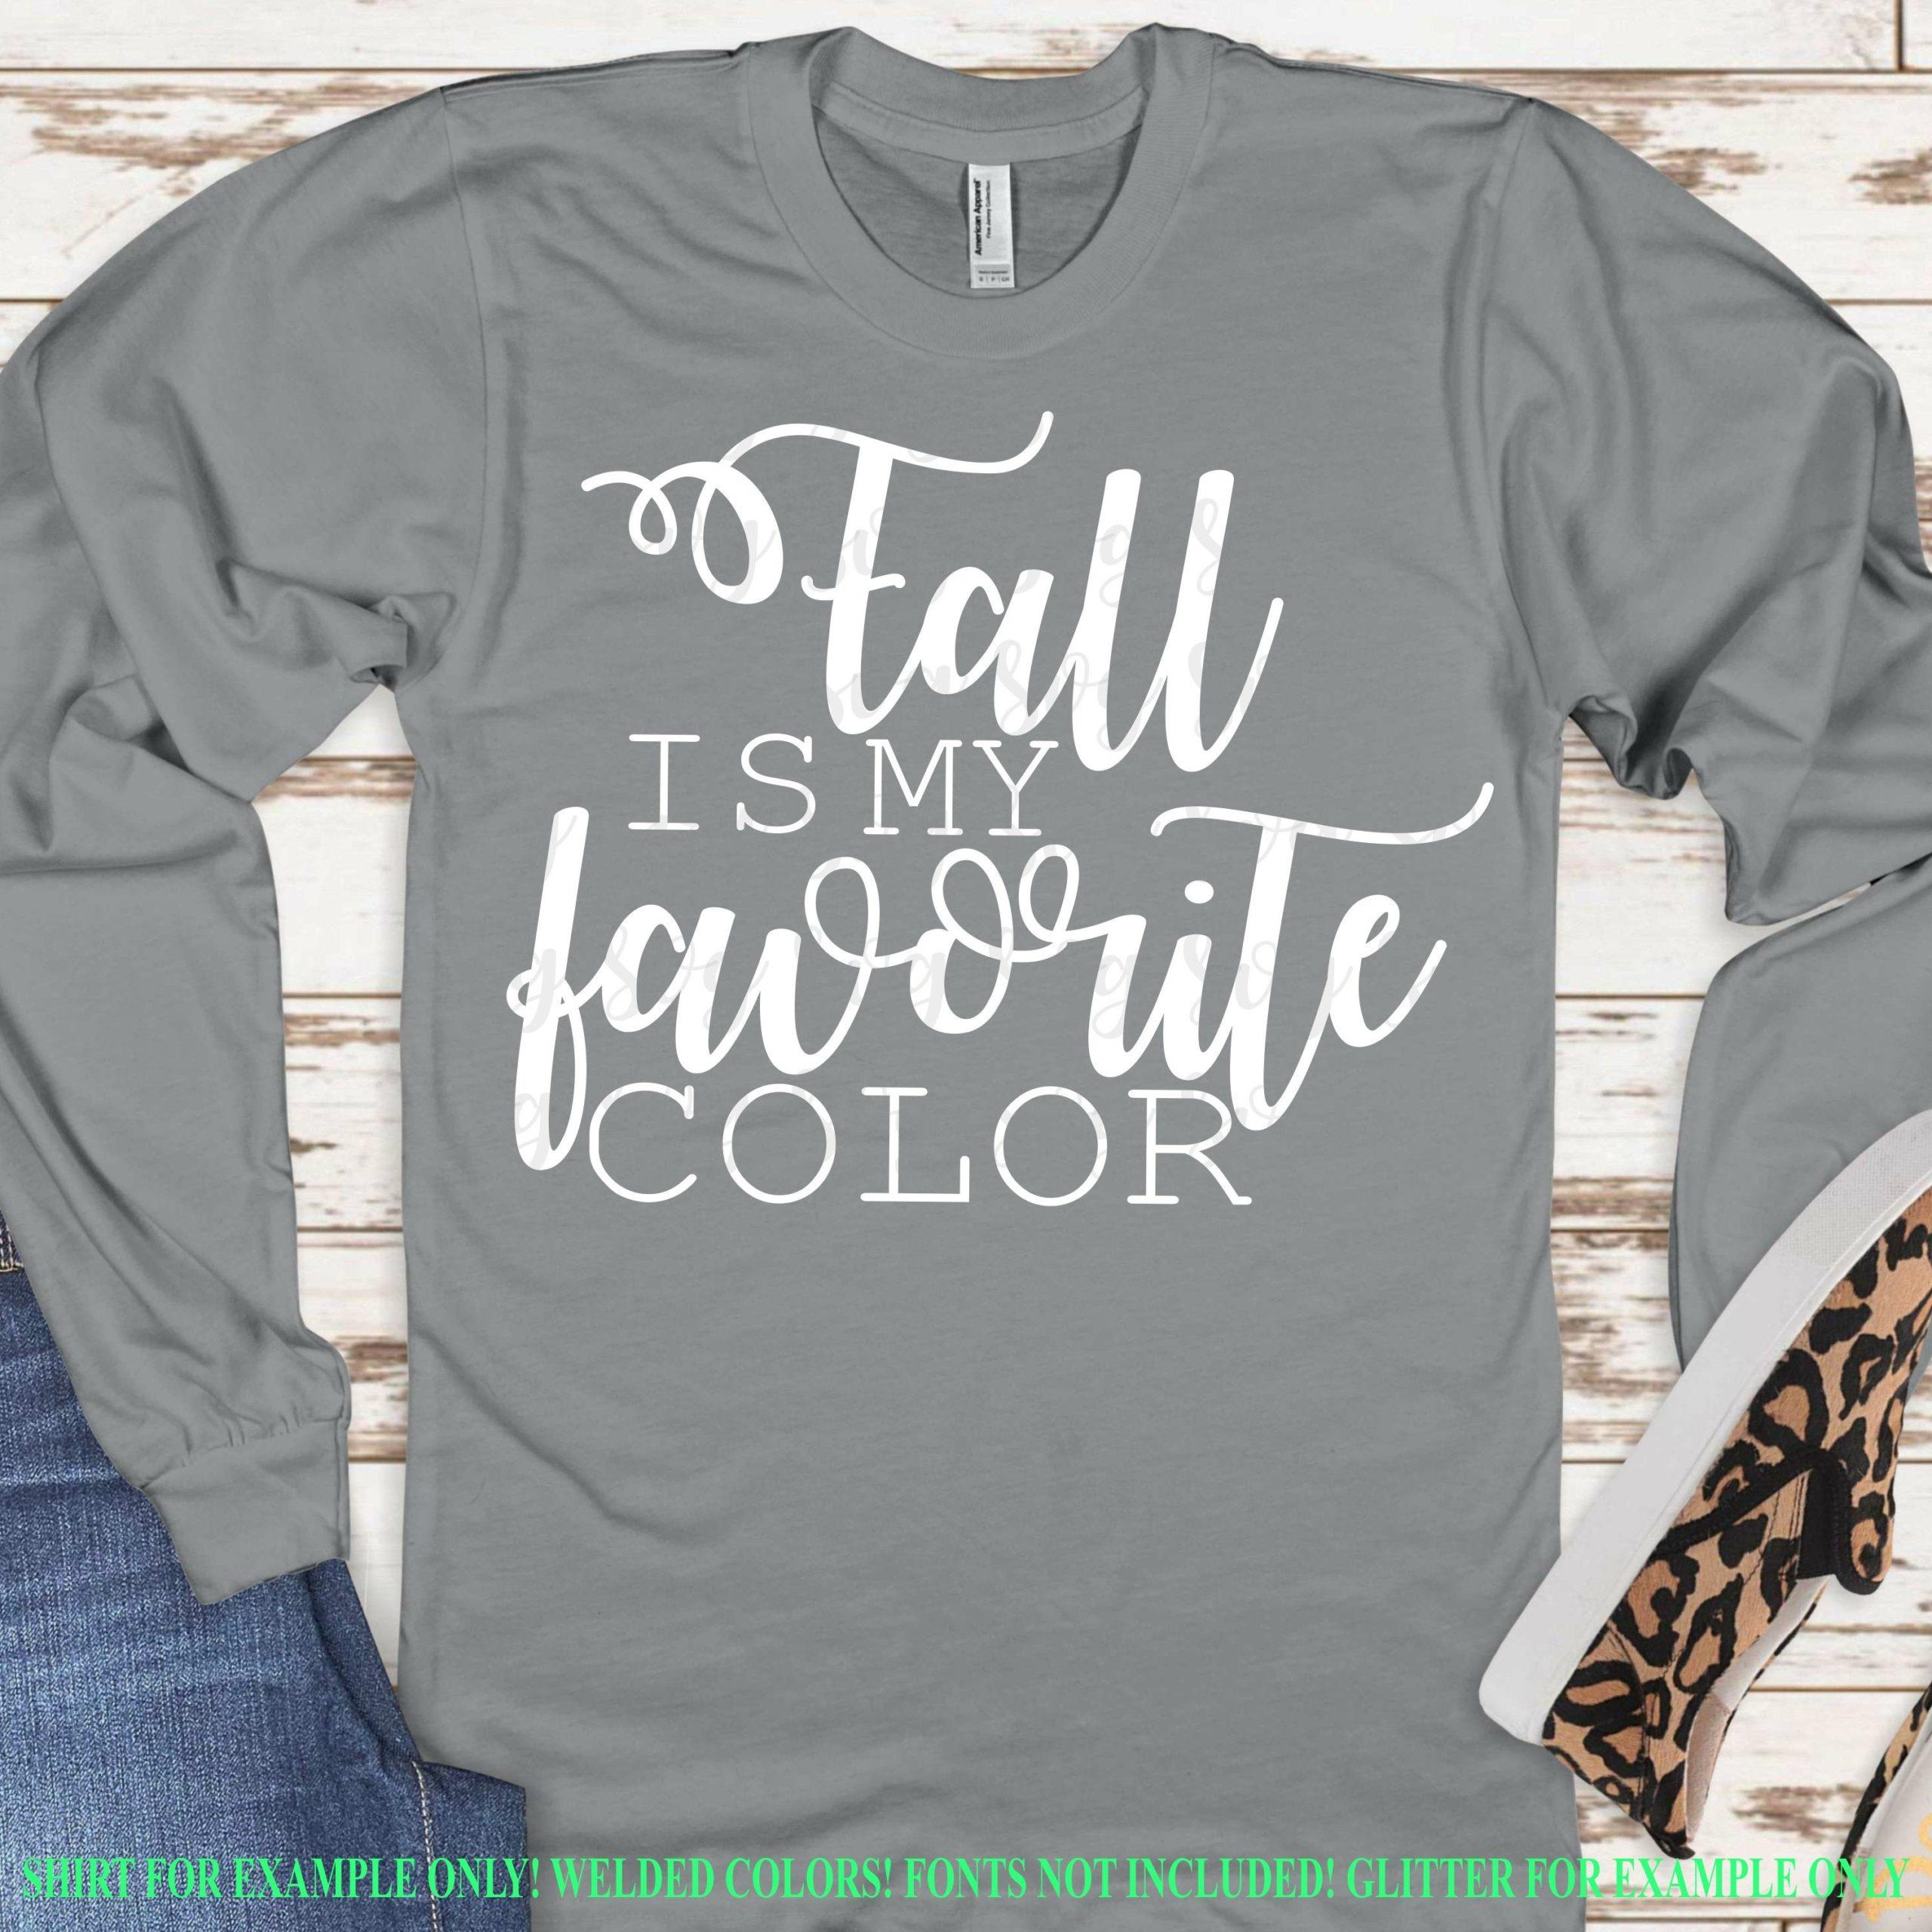 Fall-is-my-favorite-svg-fall-svg-autumn-svg-fall-sayingsfall-svg-designsfall-cut-filescricut-fall-designscricut-svgsvg-for-mobile-5f6f7174